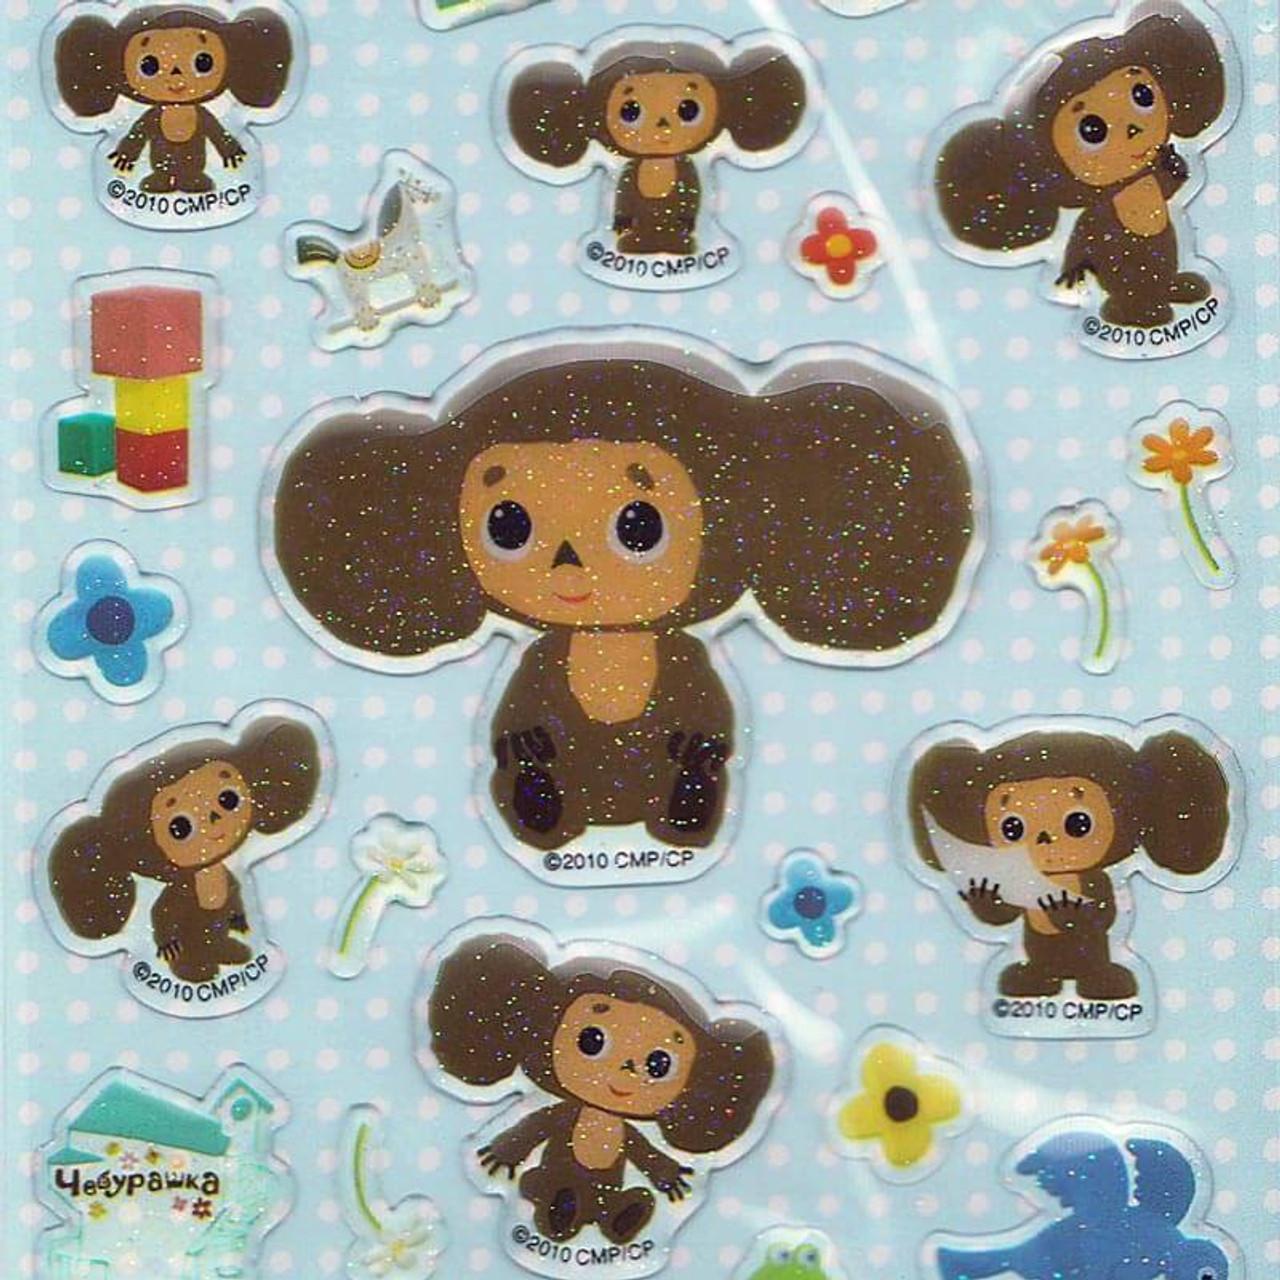 Cheburashka Yeoypawka 3D Puffy Sticker CHST04 - Daily ( Close-up )